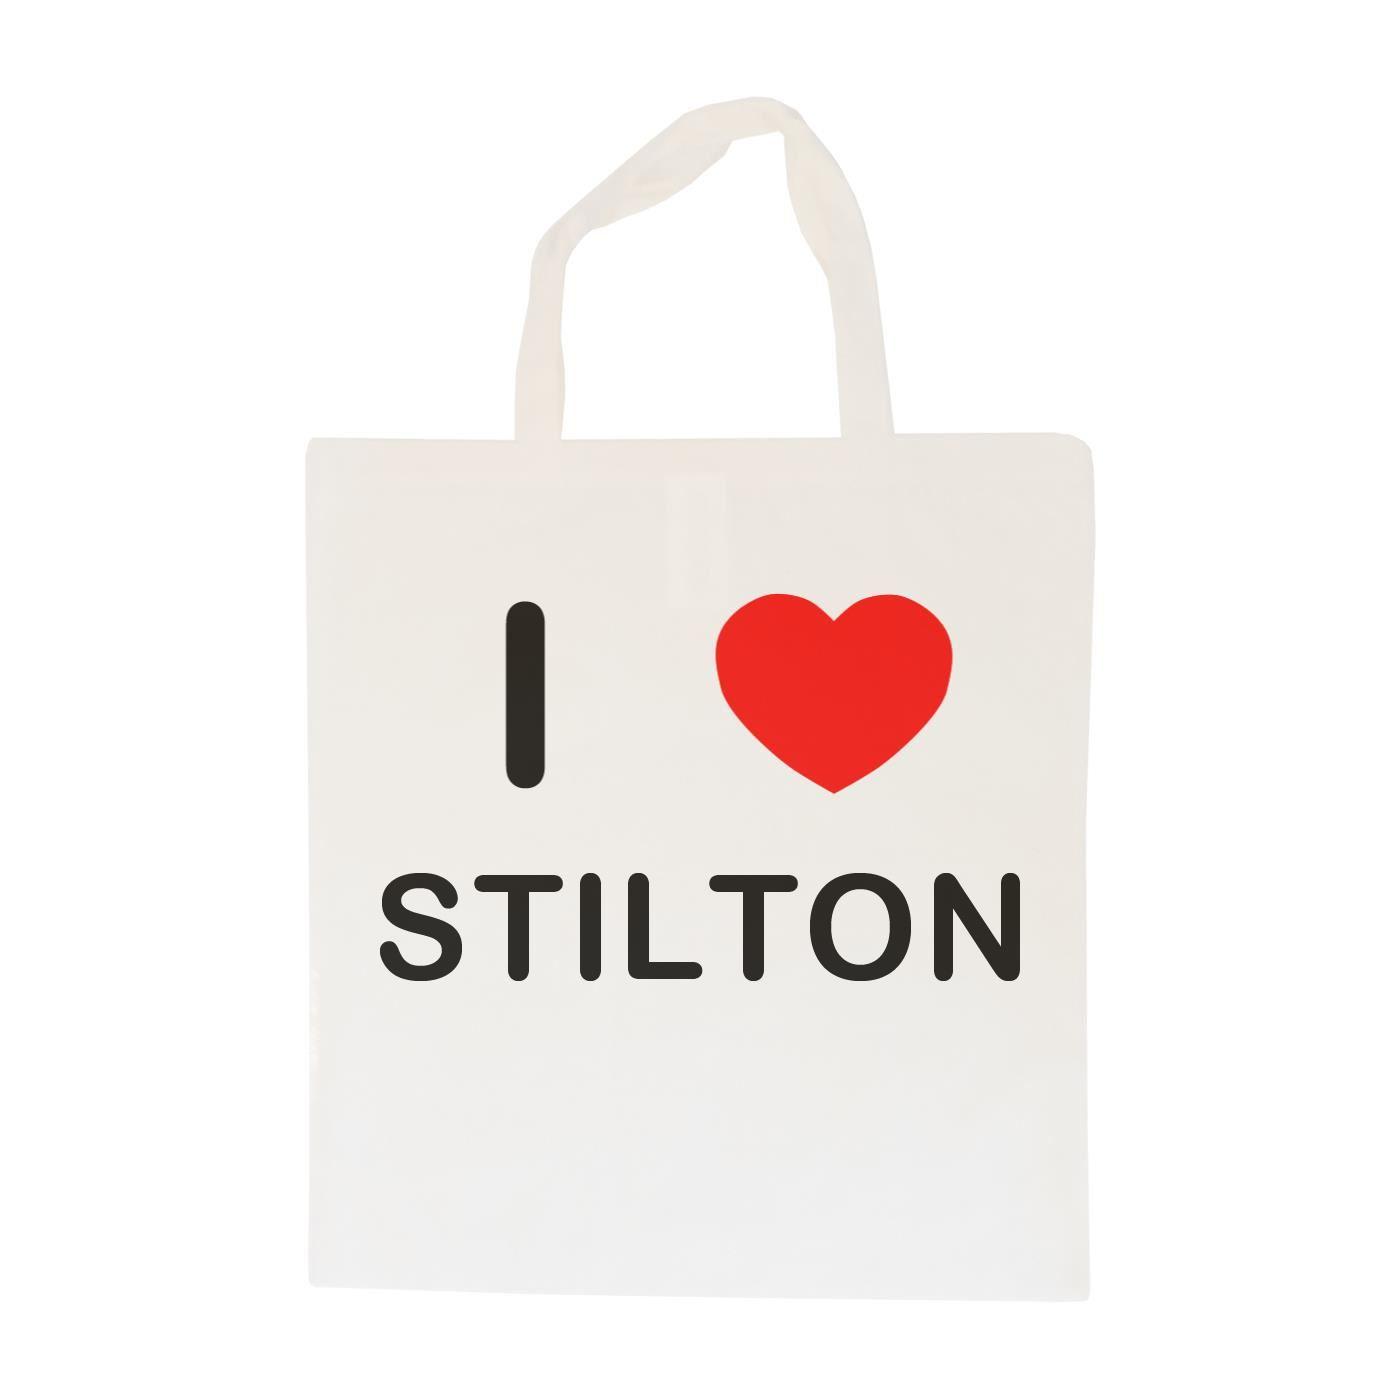 I Love Stilton - Cotton Bag | Size choice Tote, Shopper or Sling